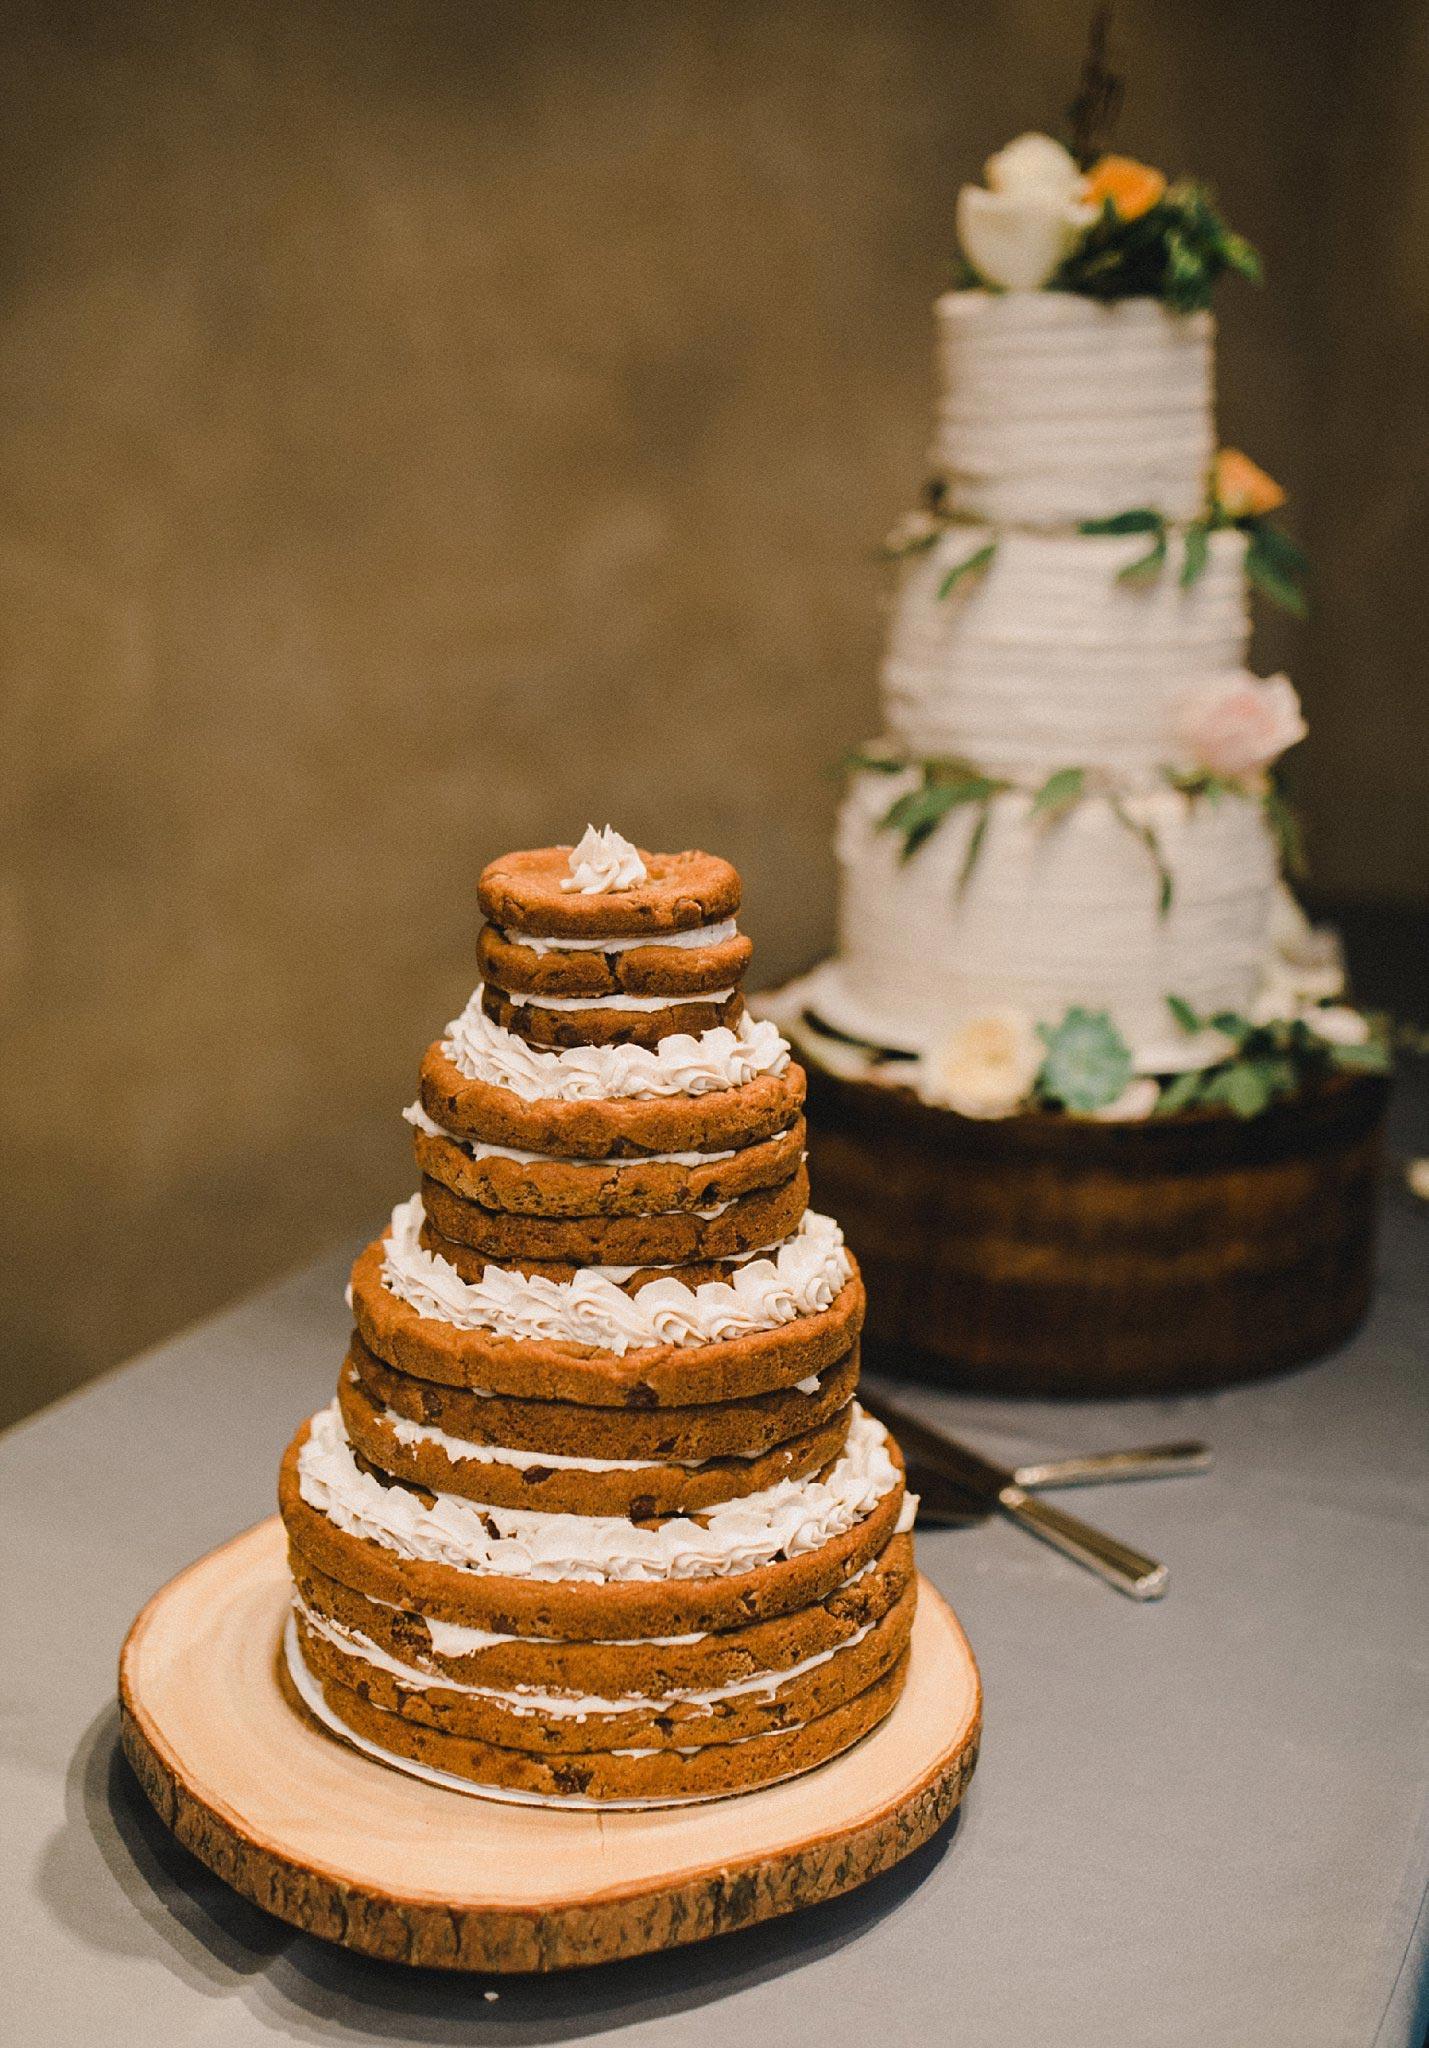 Layered cookie cake groom's cake